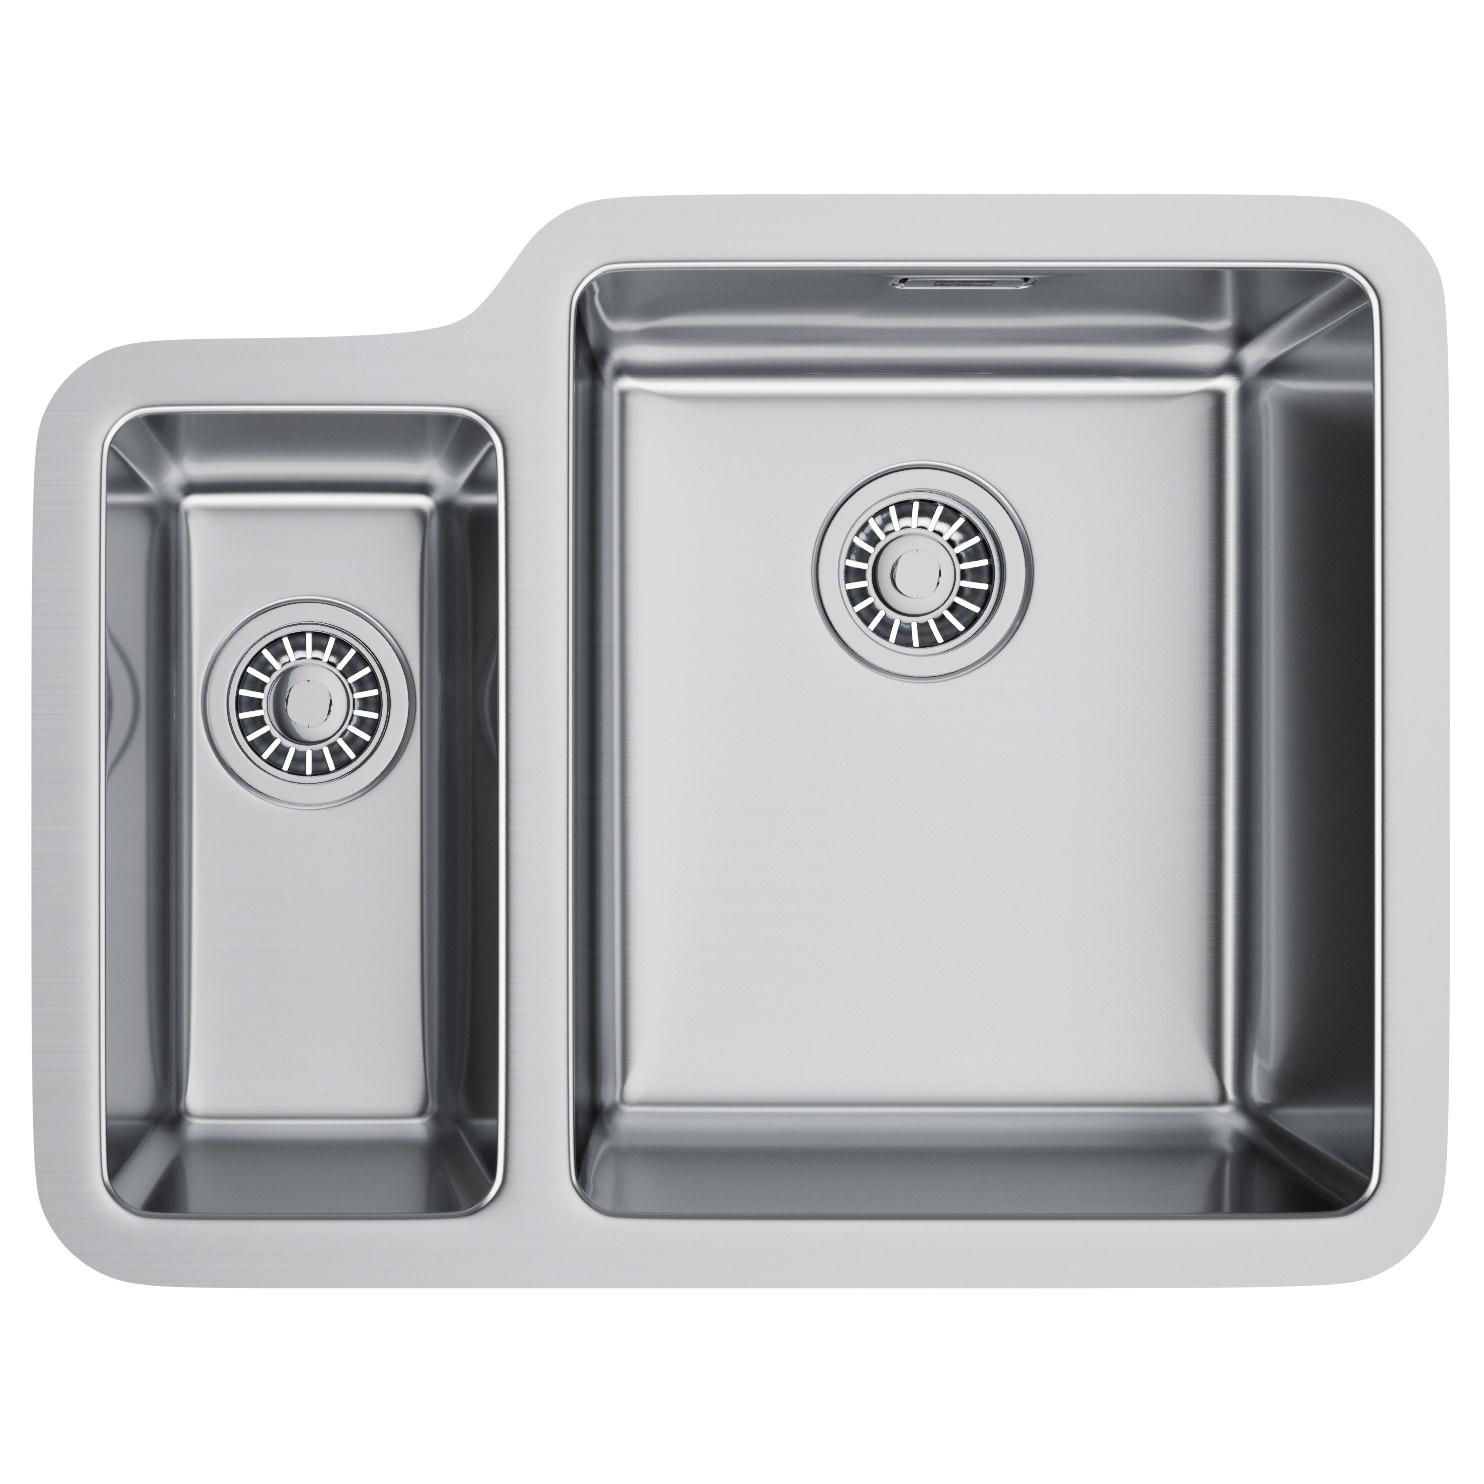 Franke Kubus Undermount Sink : Franke Kubus KBX 160 34-16 Stainless Steel 1.5 Bowl Undermount Sink ...